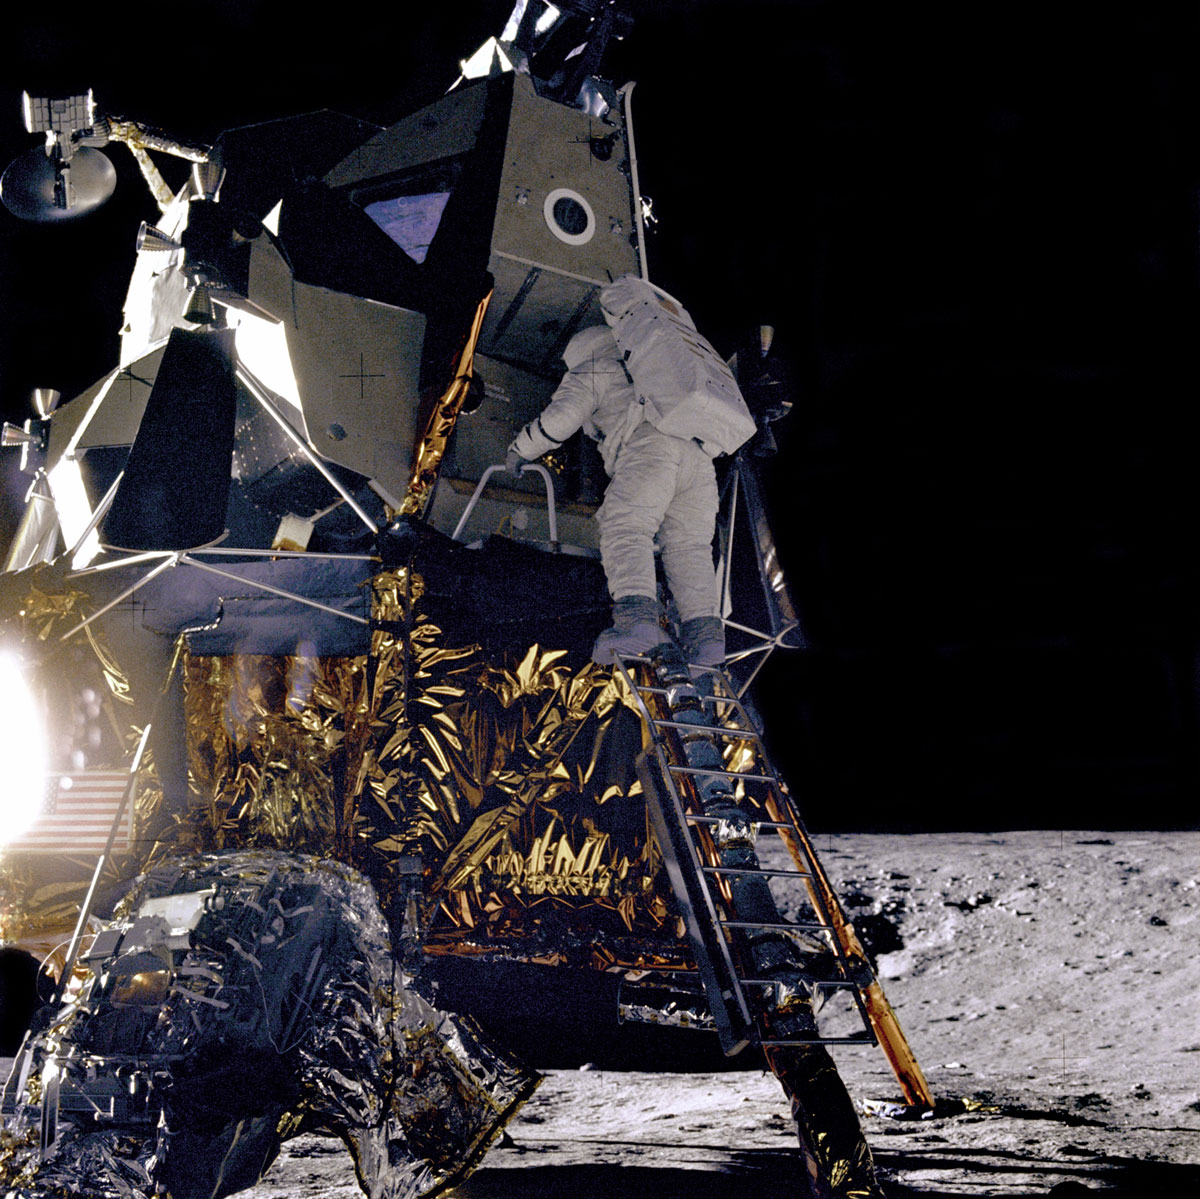 apollo space program history - photo #45